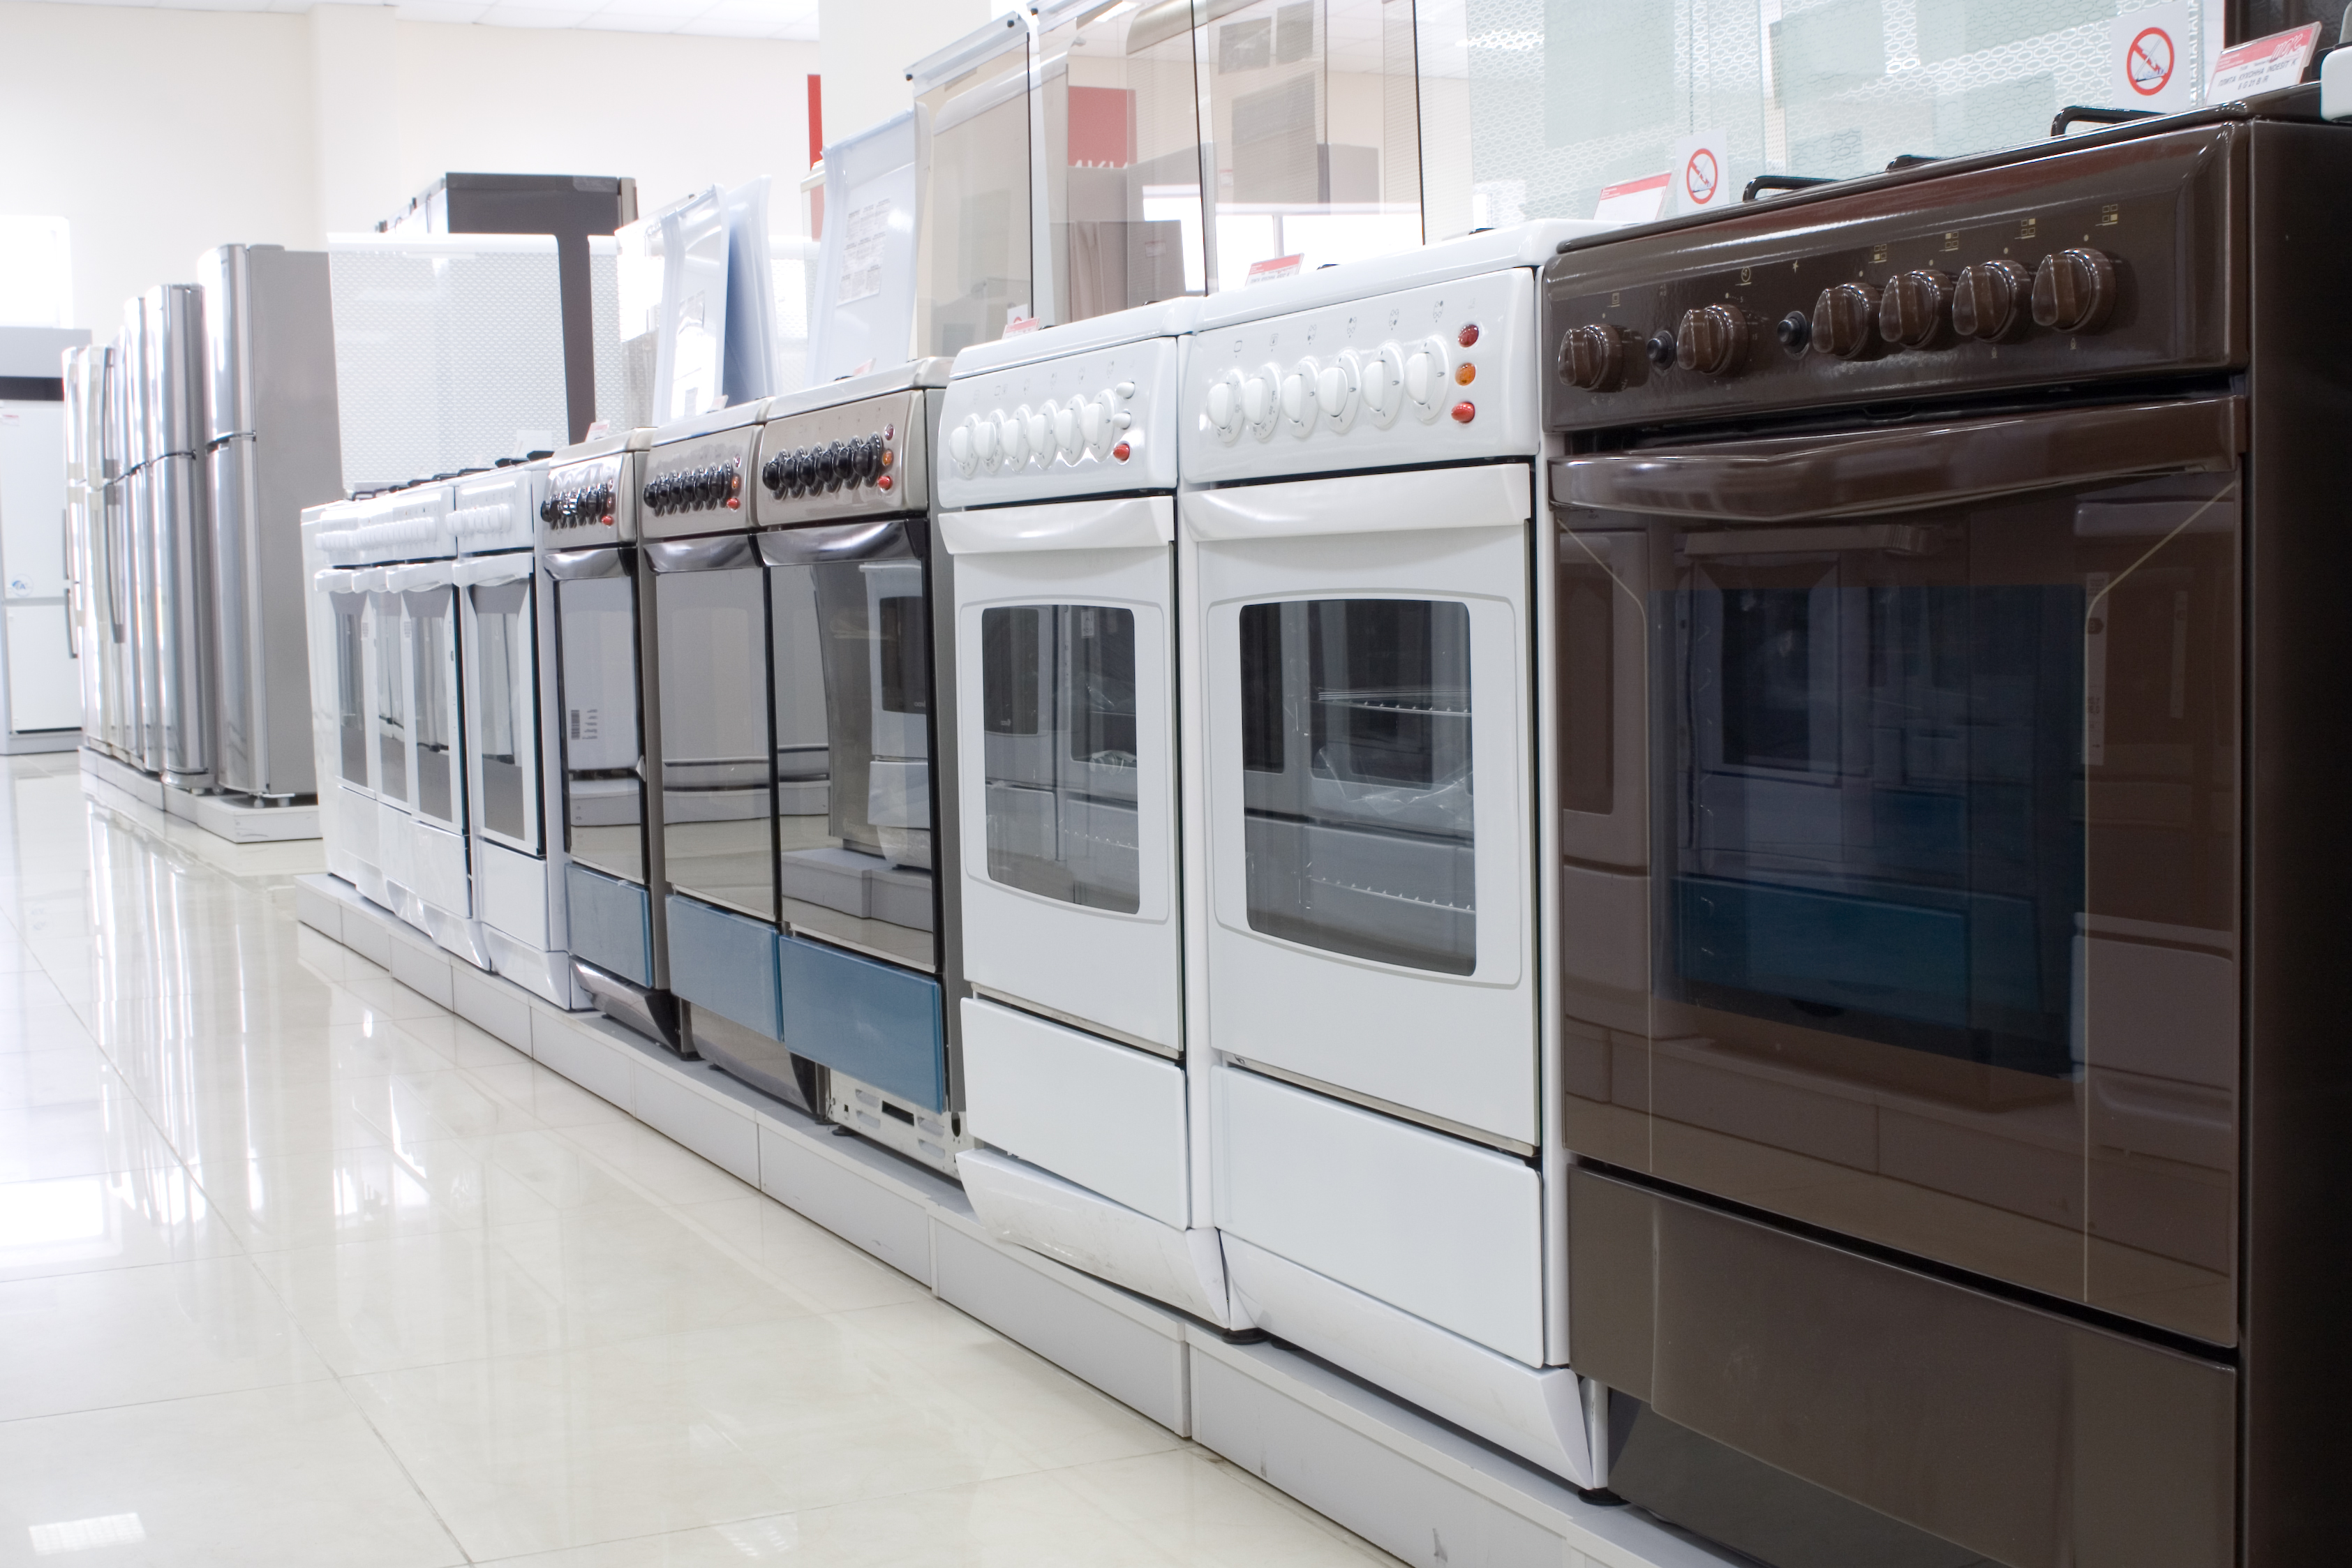 Electrodomésticos: Productos de Merkathlon Mercado de Ocasión